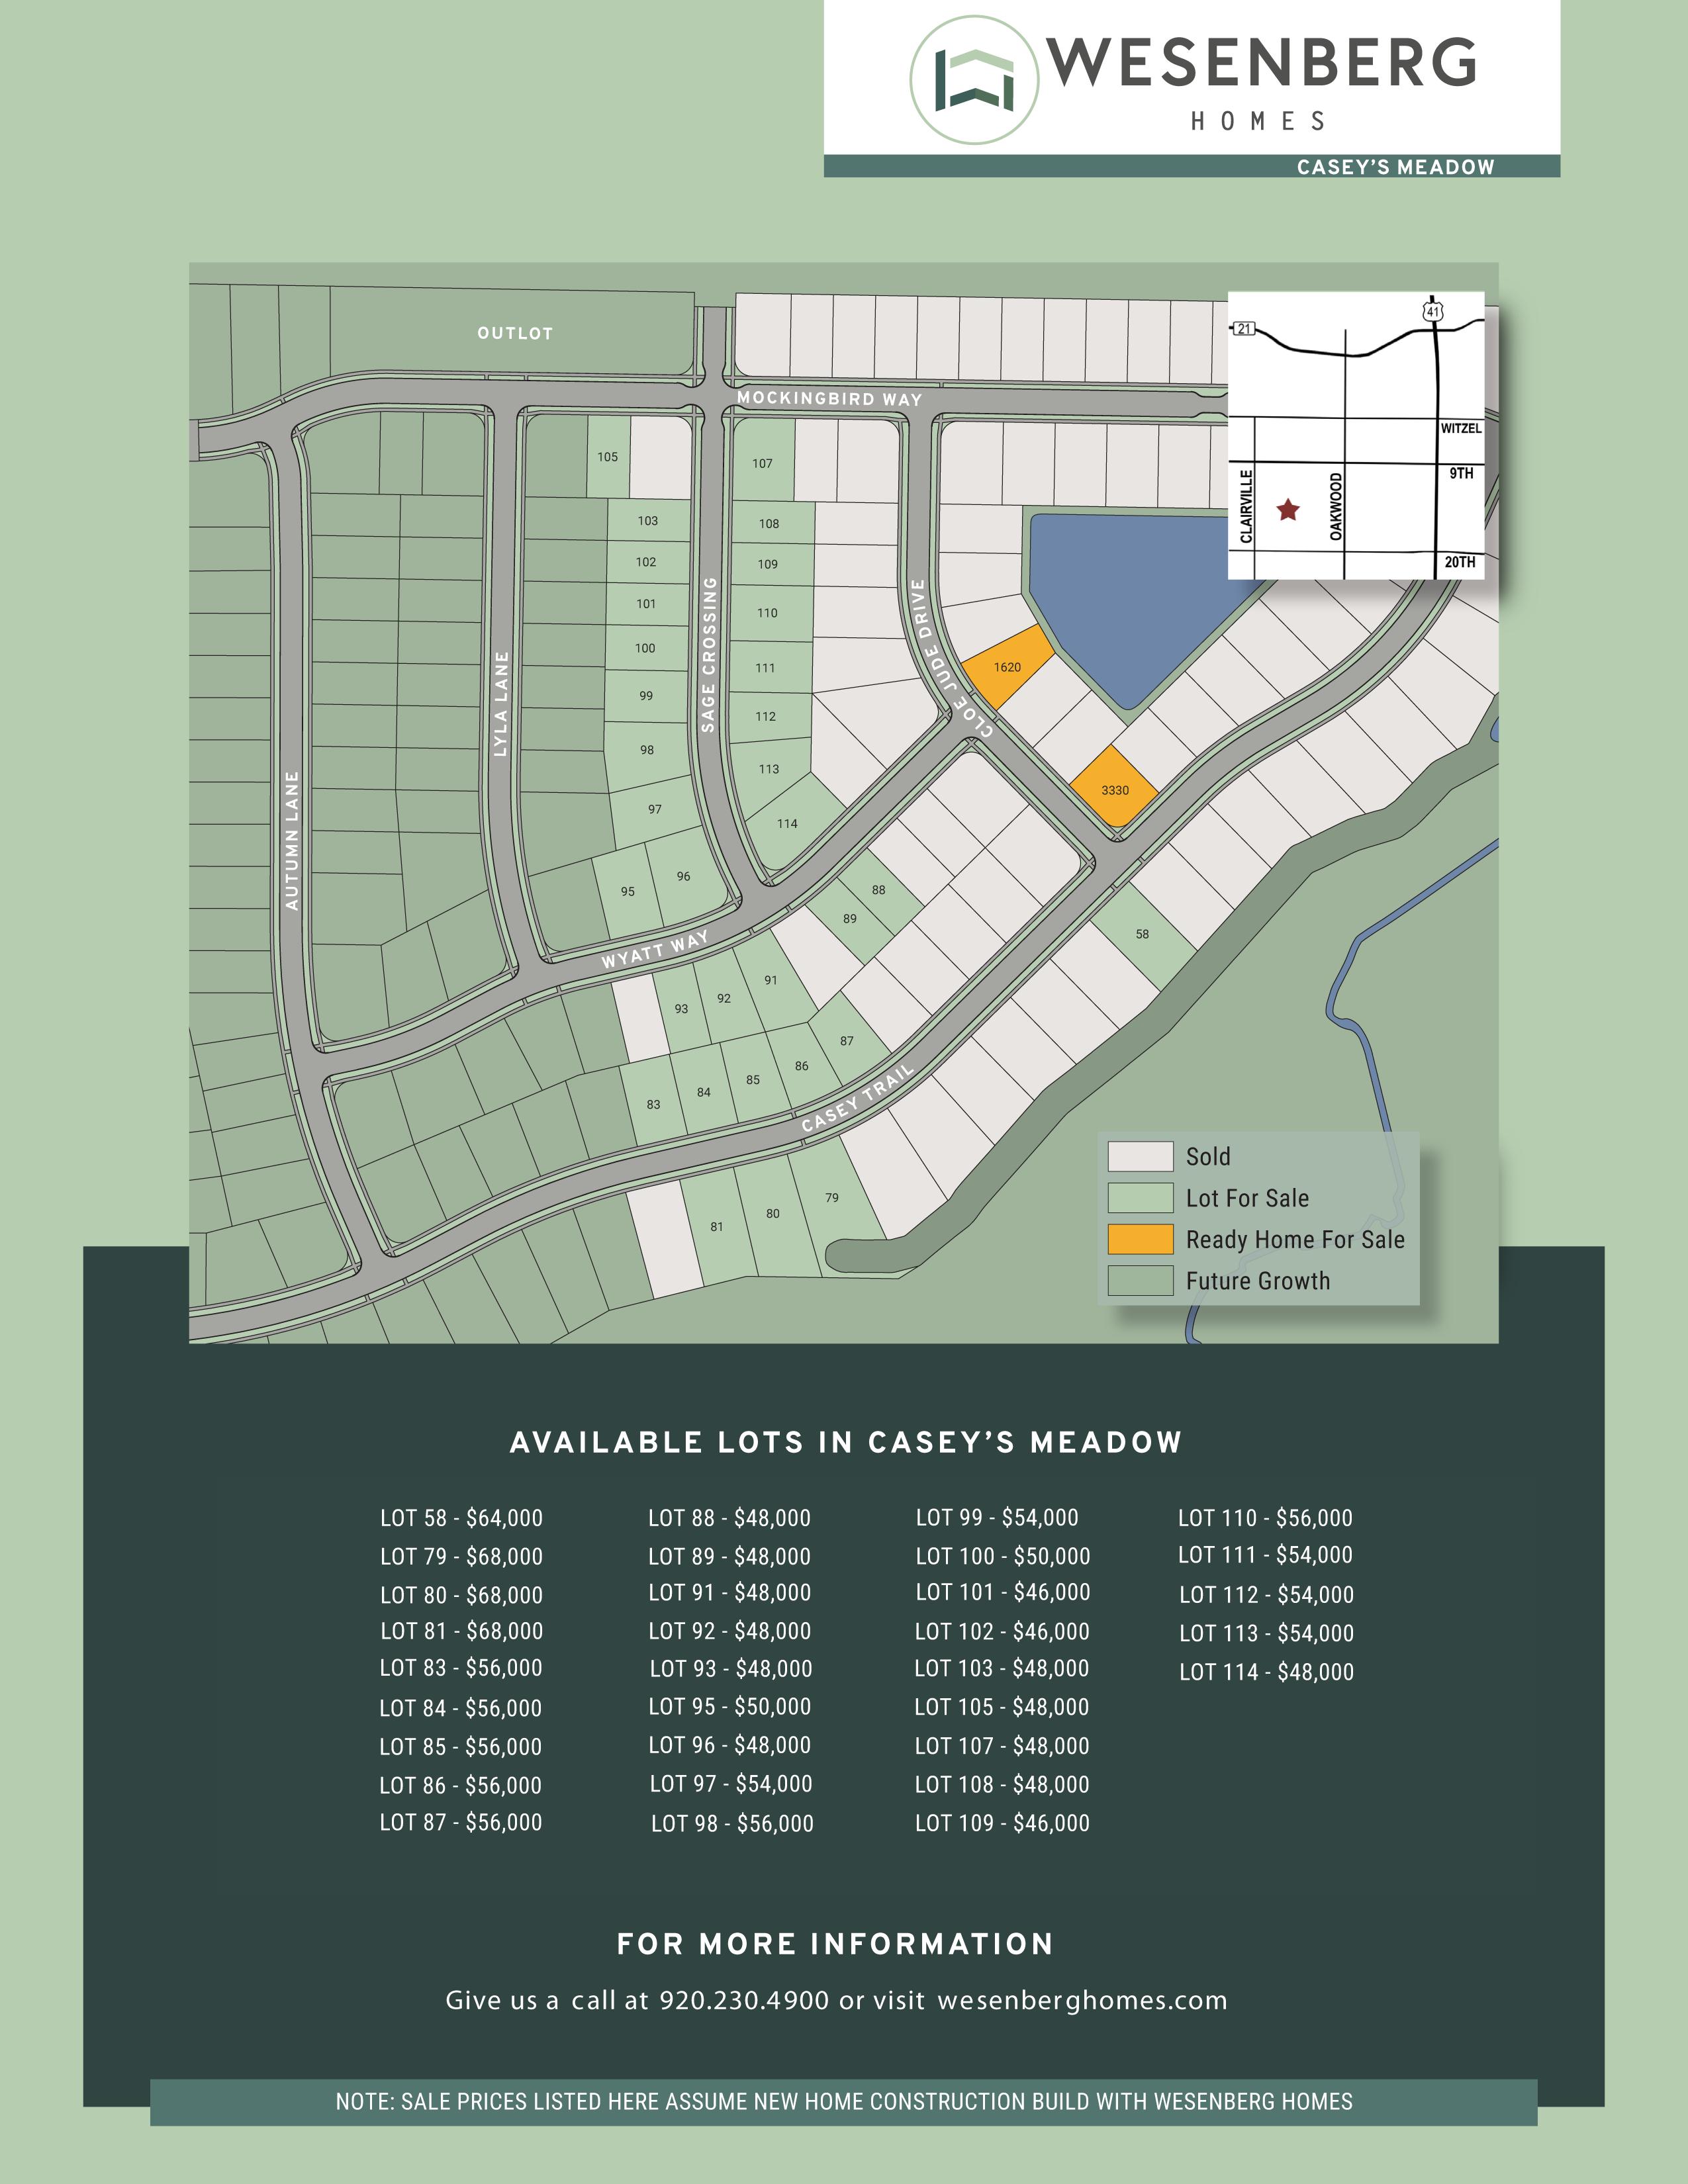 Casey's-Meadow-Oshkosh-Lots-for-Sale